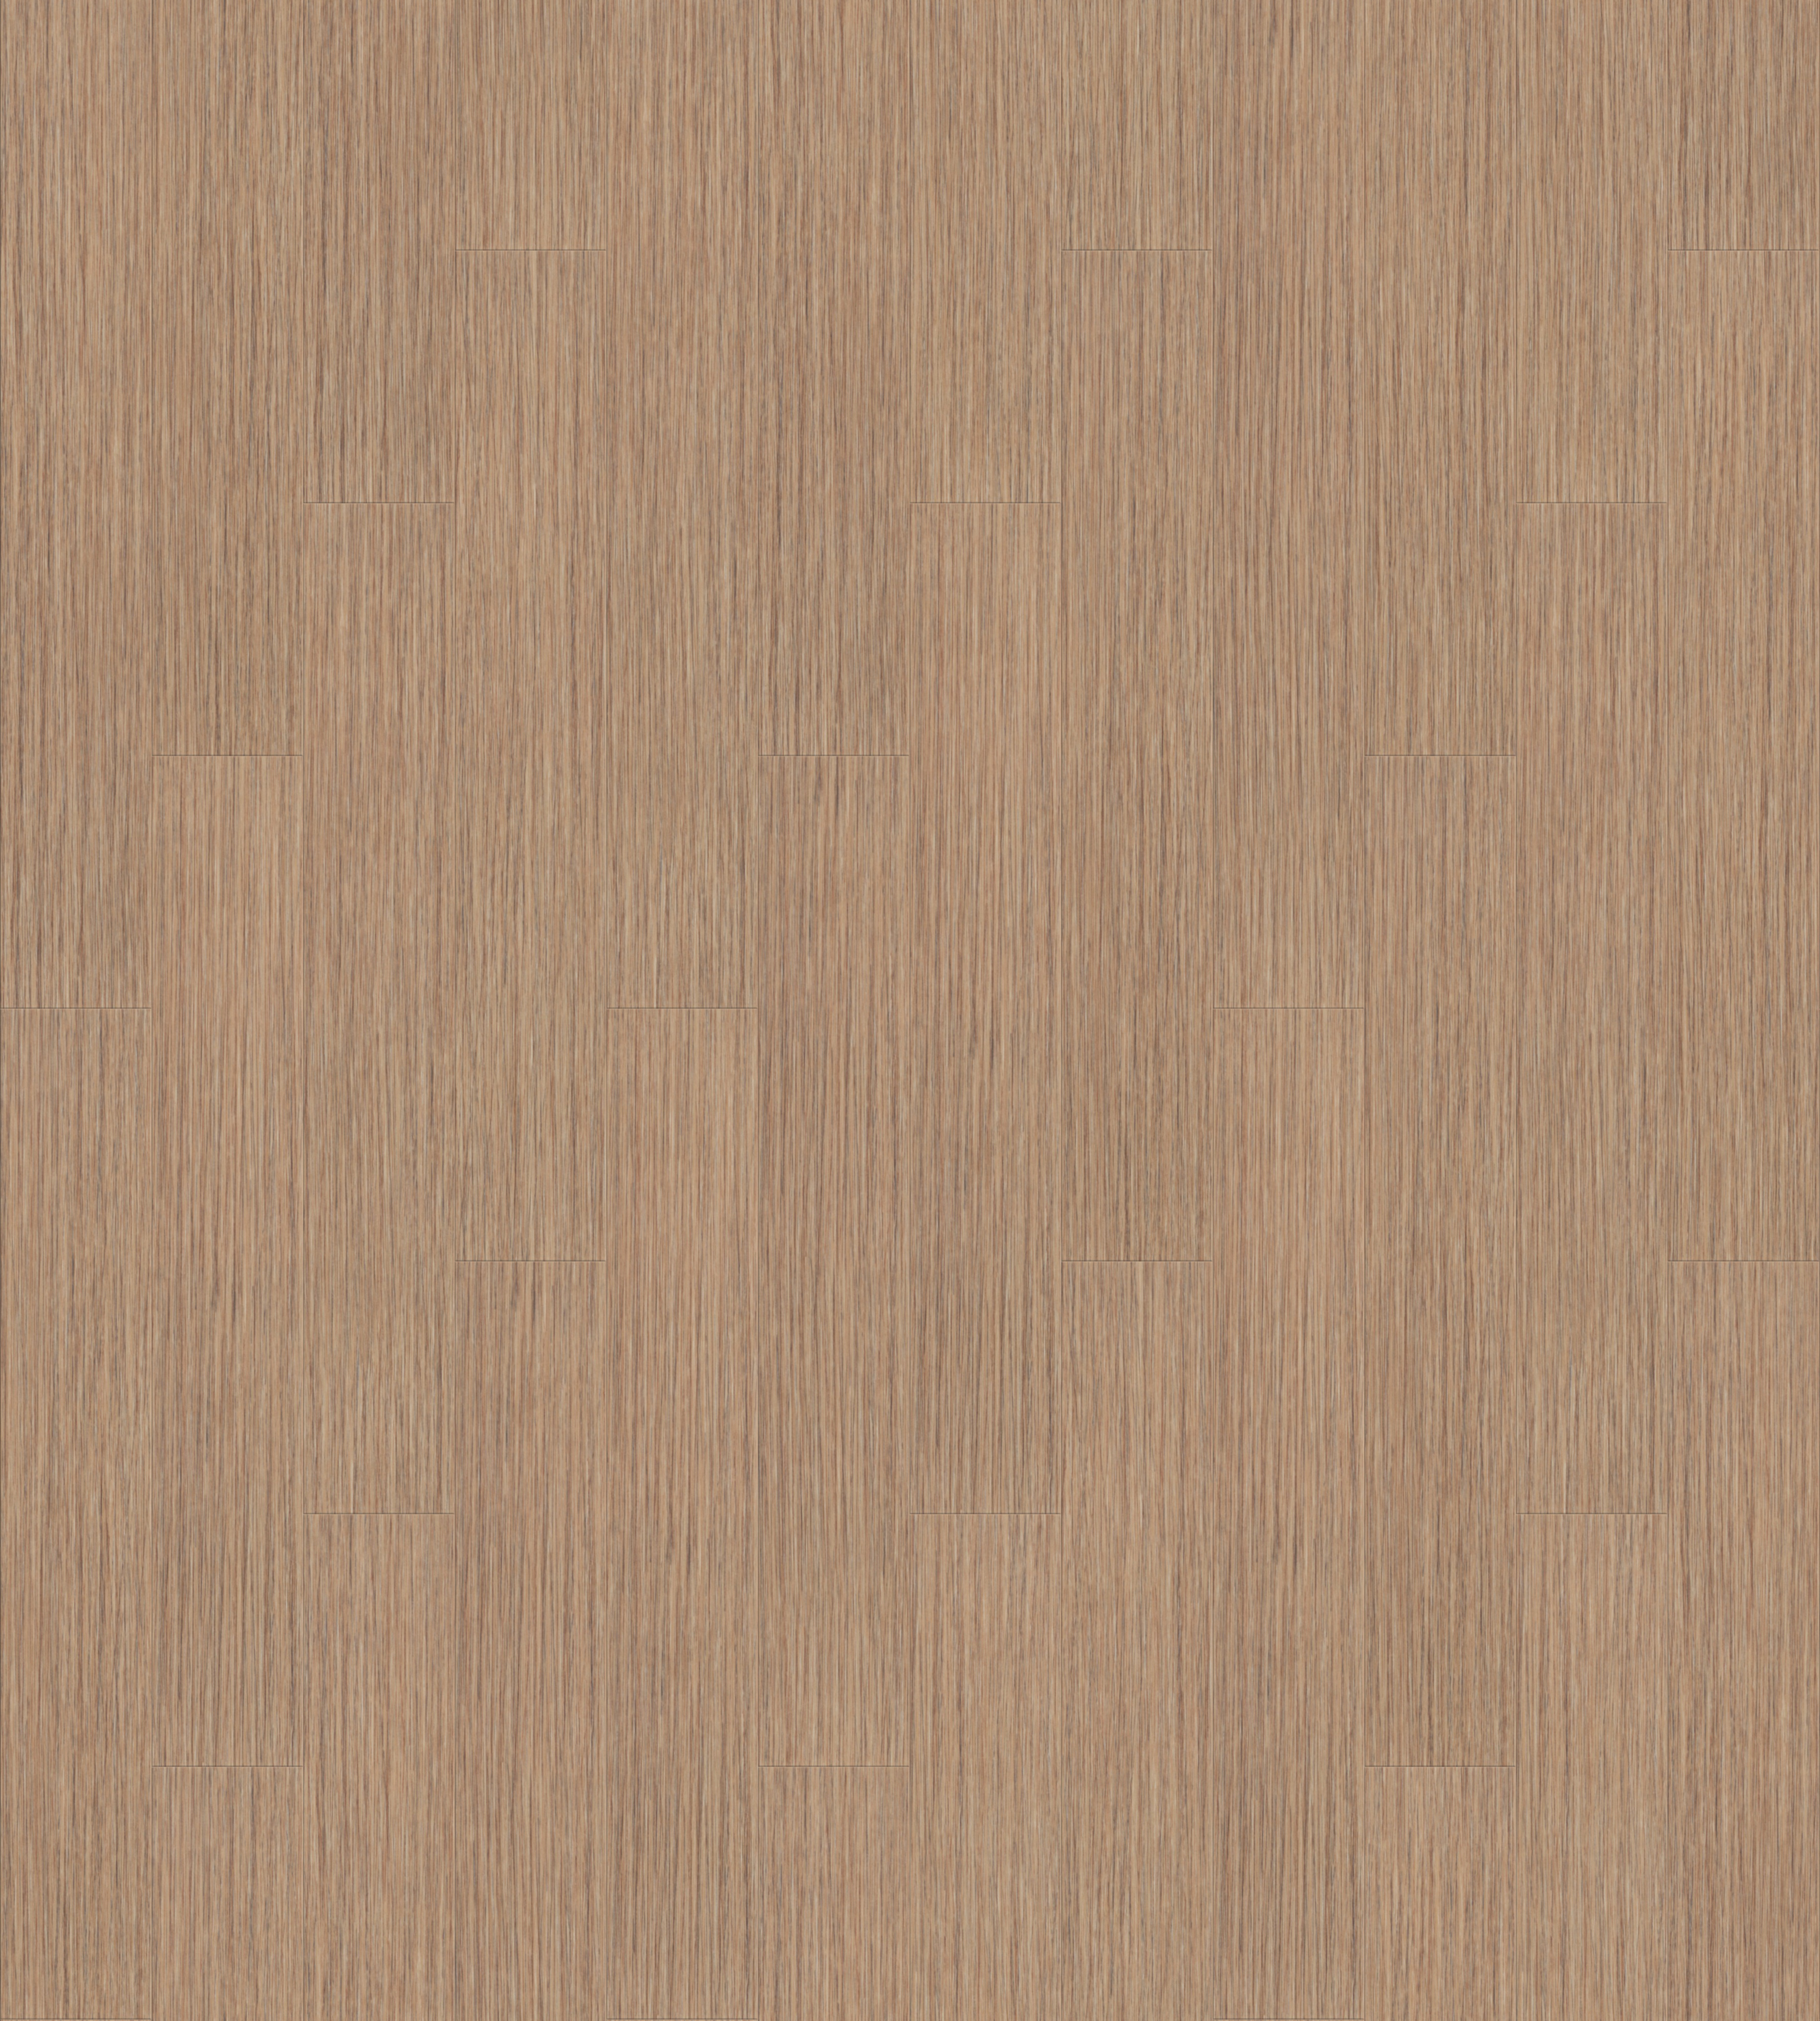 Allura_Wood-w61255_natural_seagrass-1